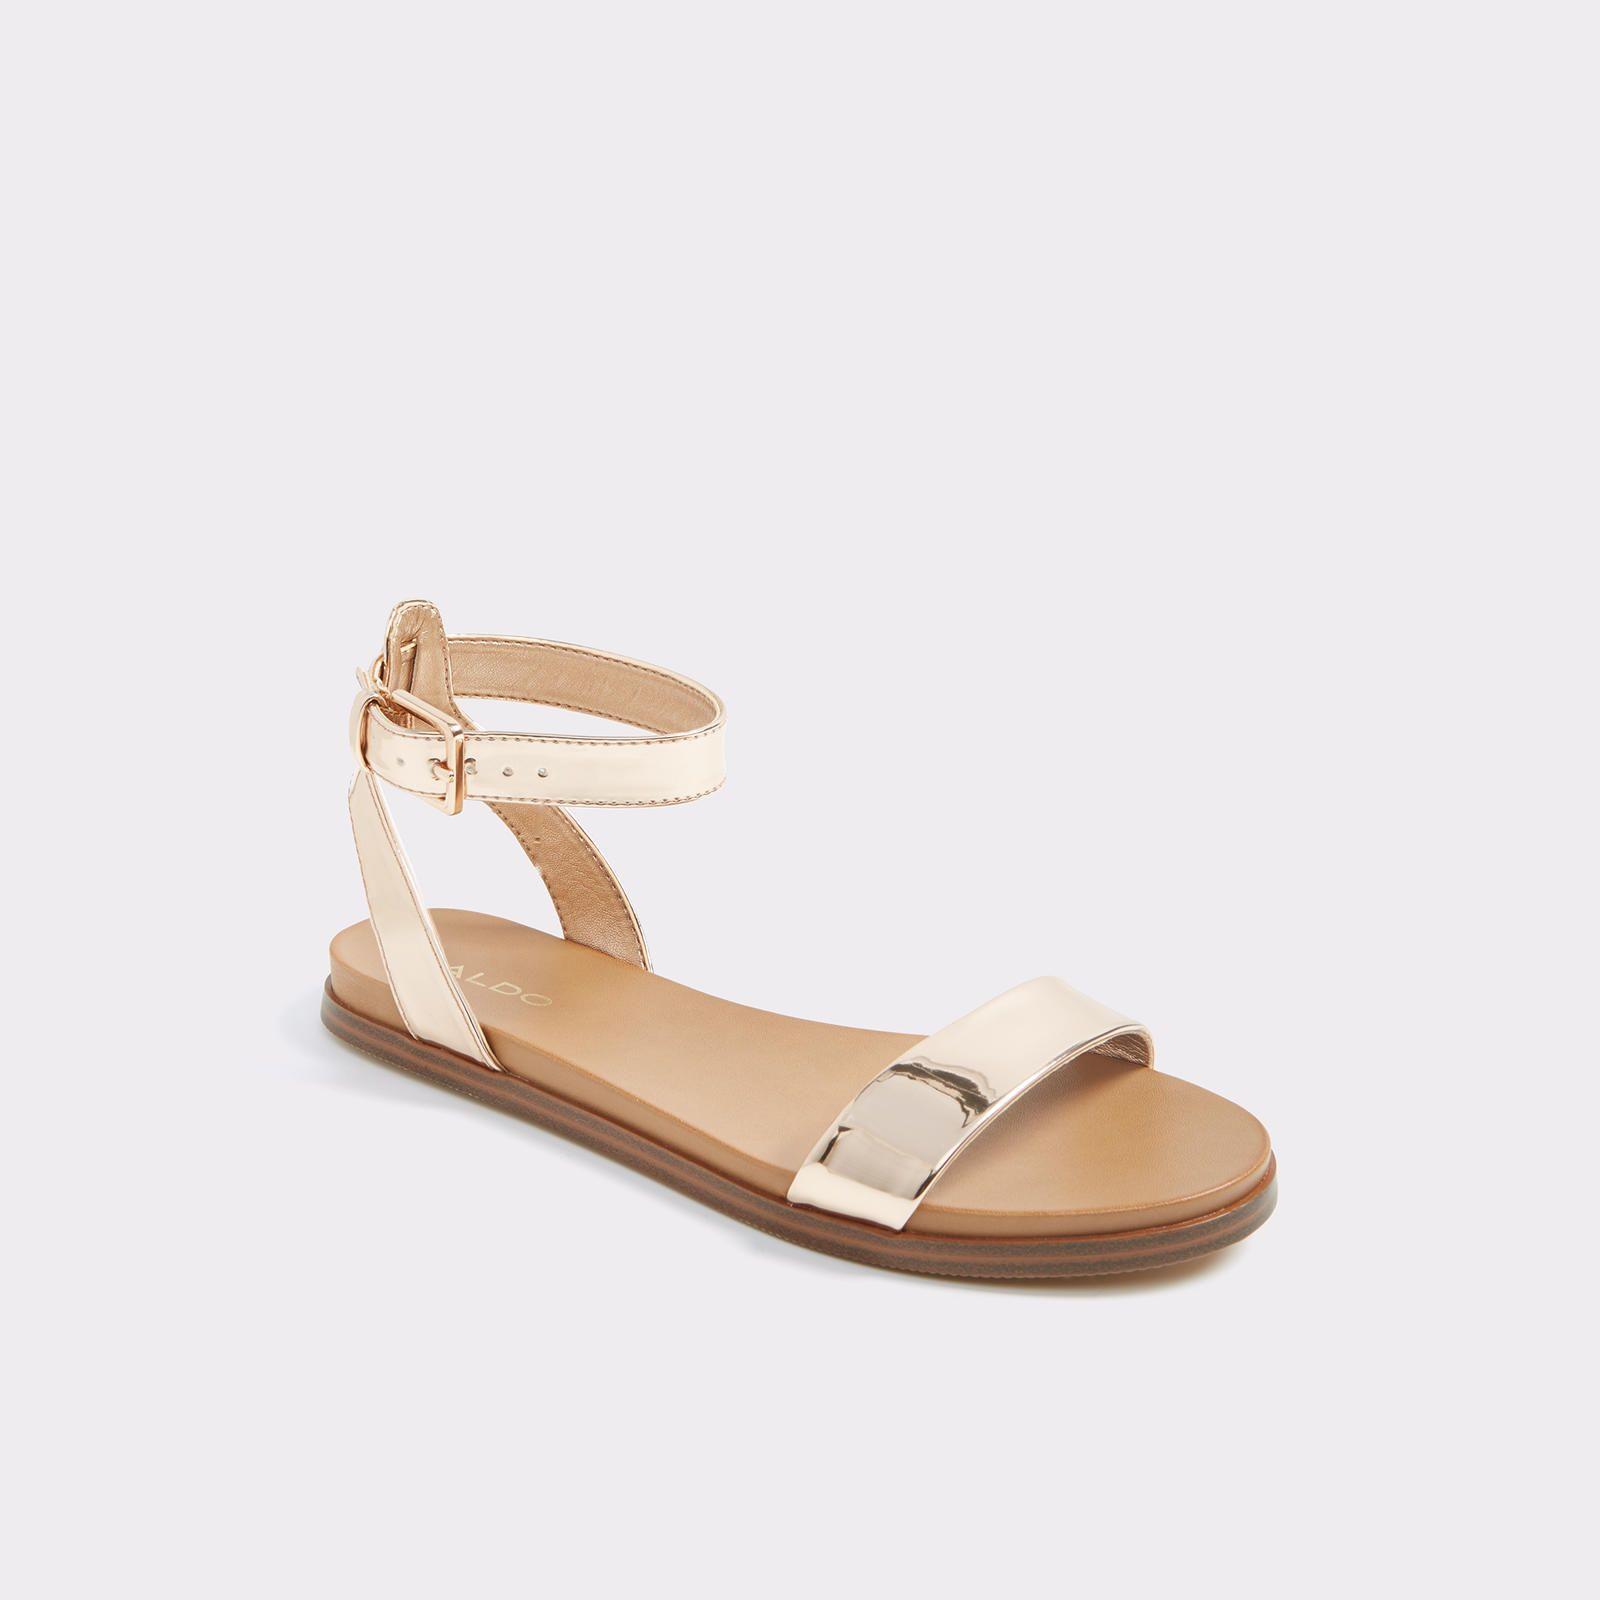 b3aad478d08a Gwenna Metallic Misc. Women s Flats